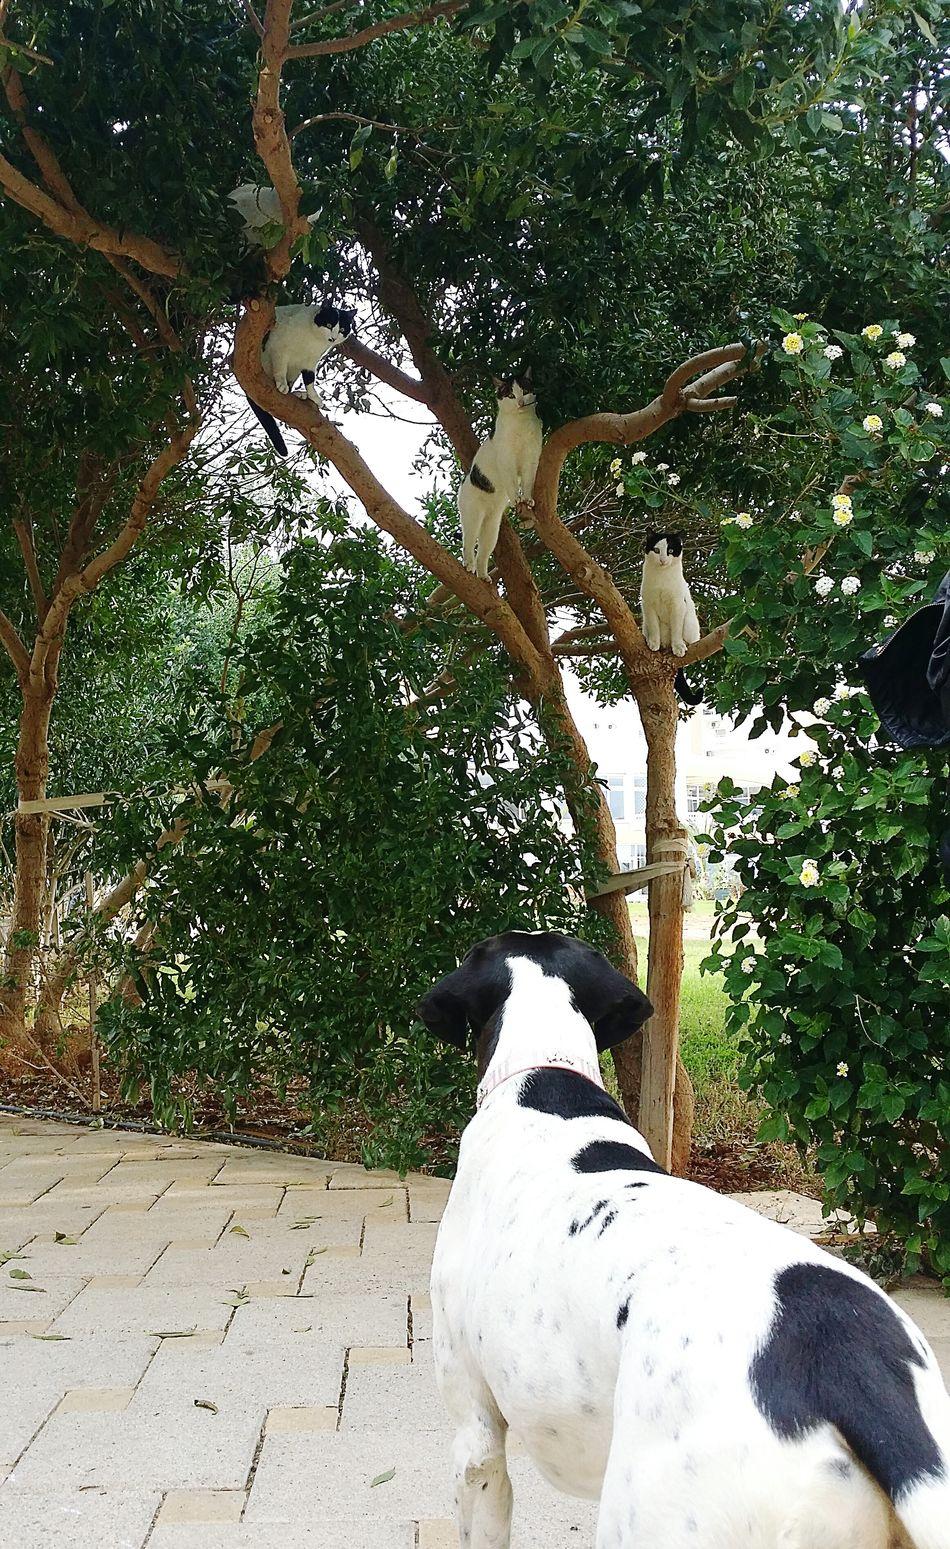 Dogs Cats Cyprus Nature Enjoying Life